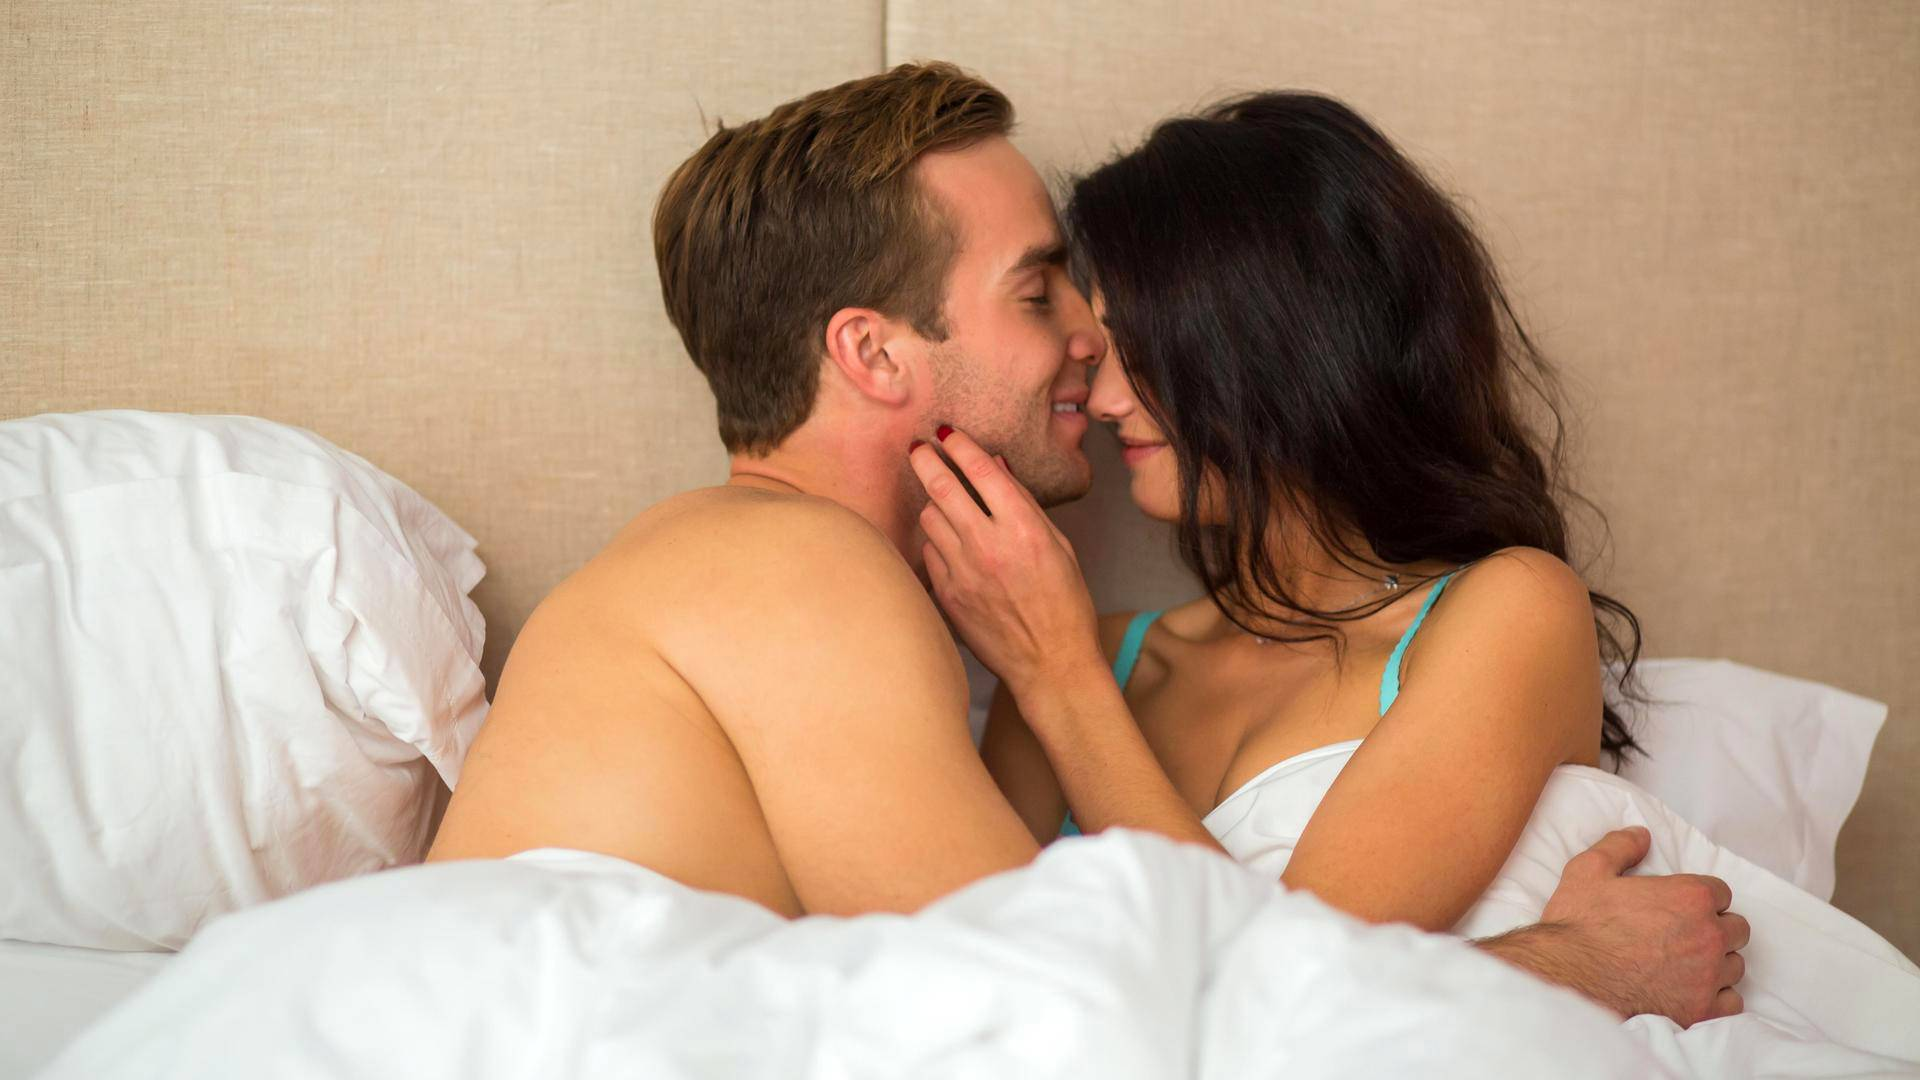 Rachel McAdams Ryan Gosling dating historia